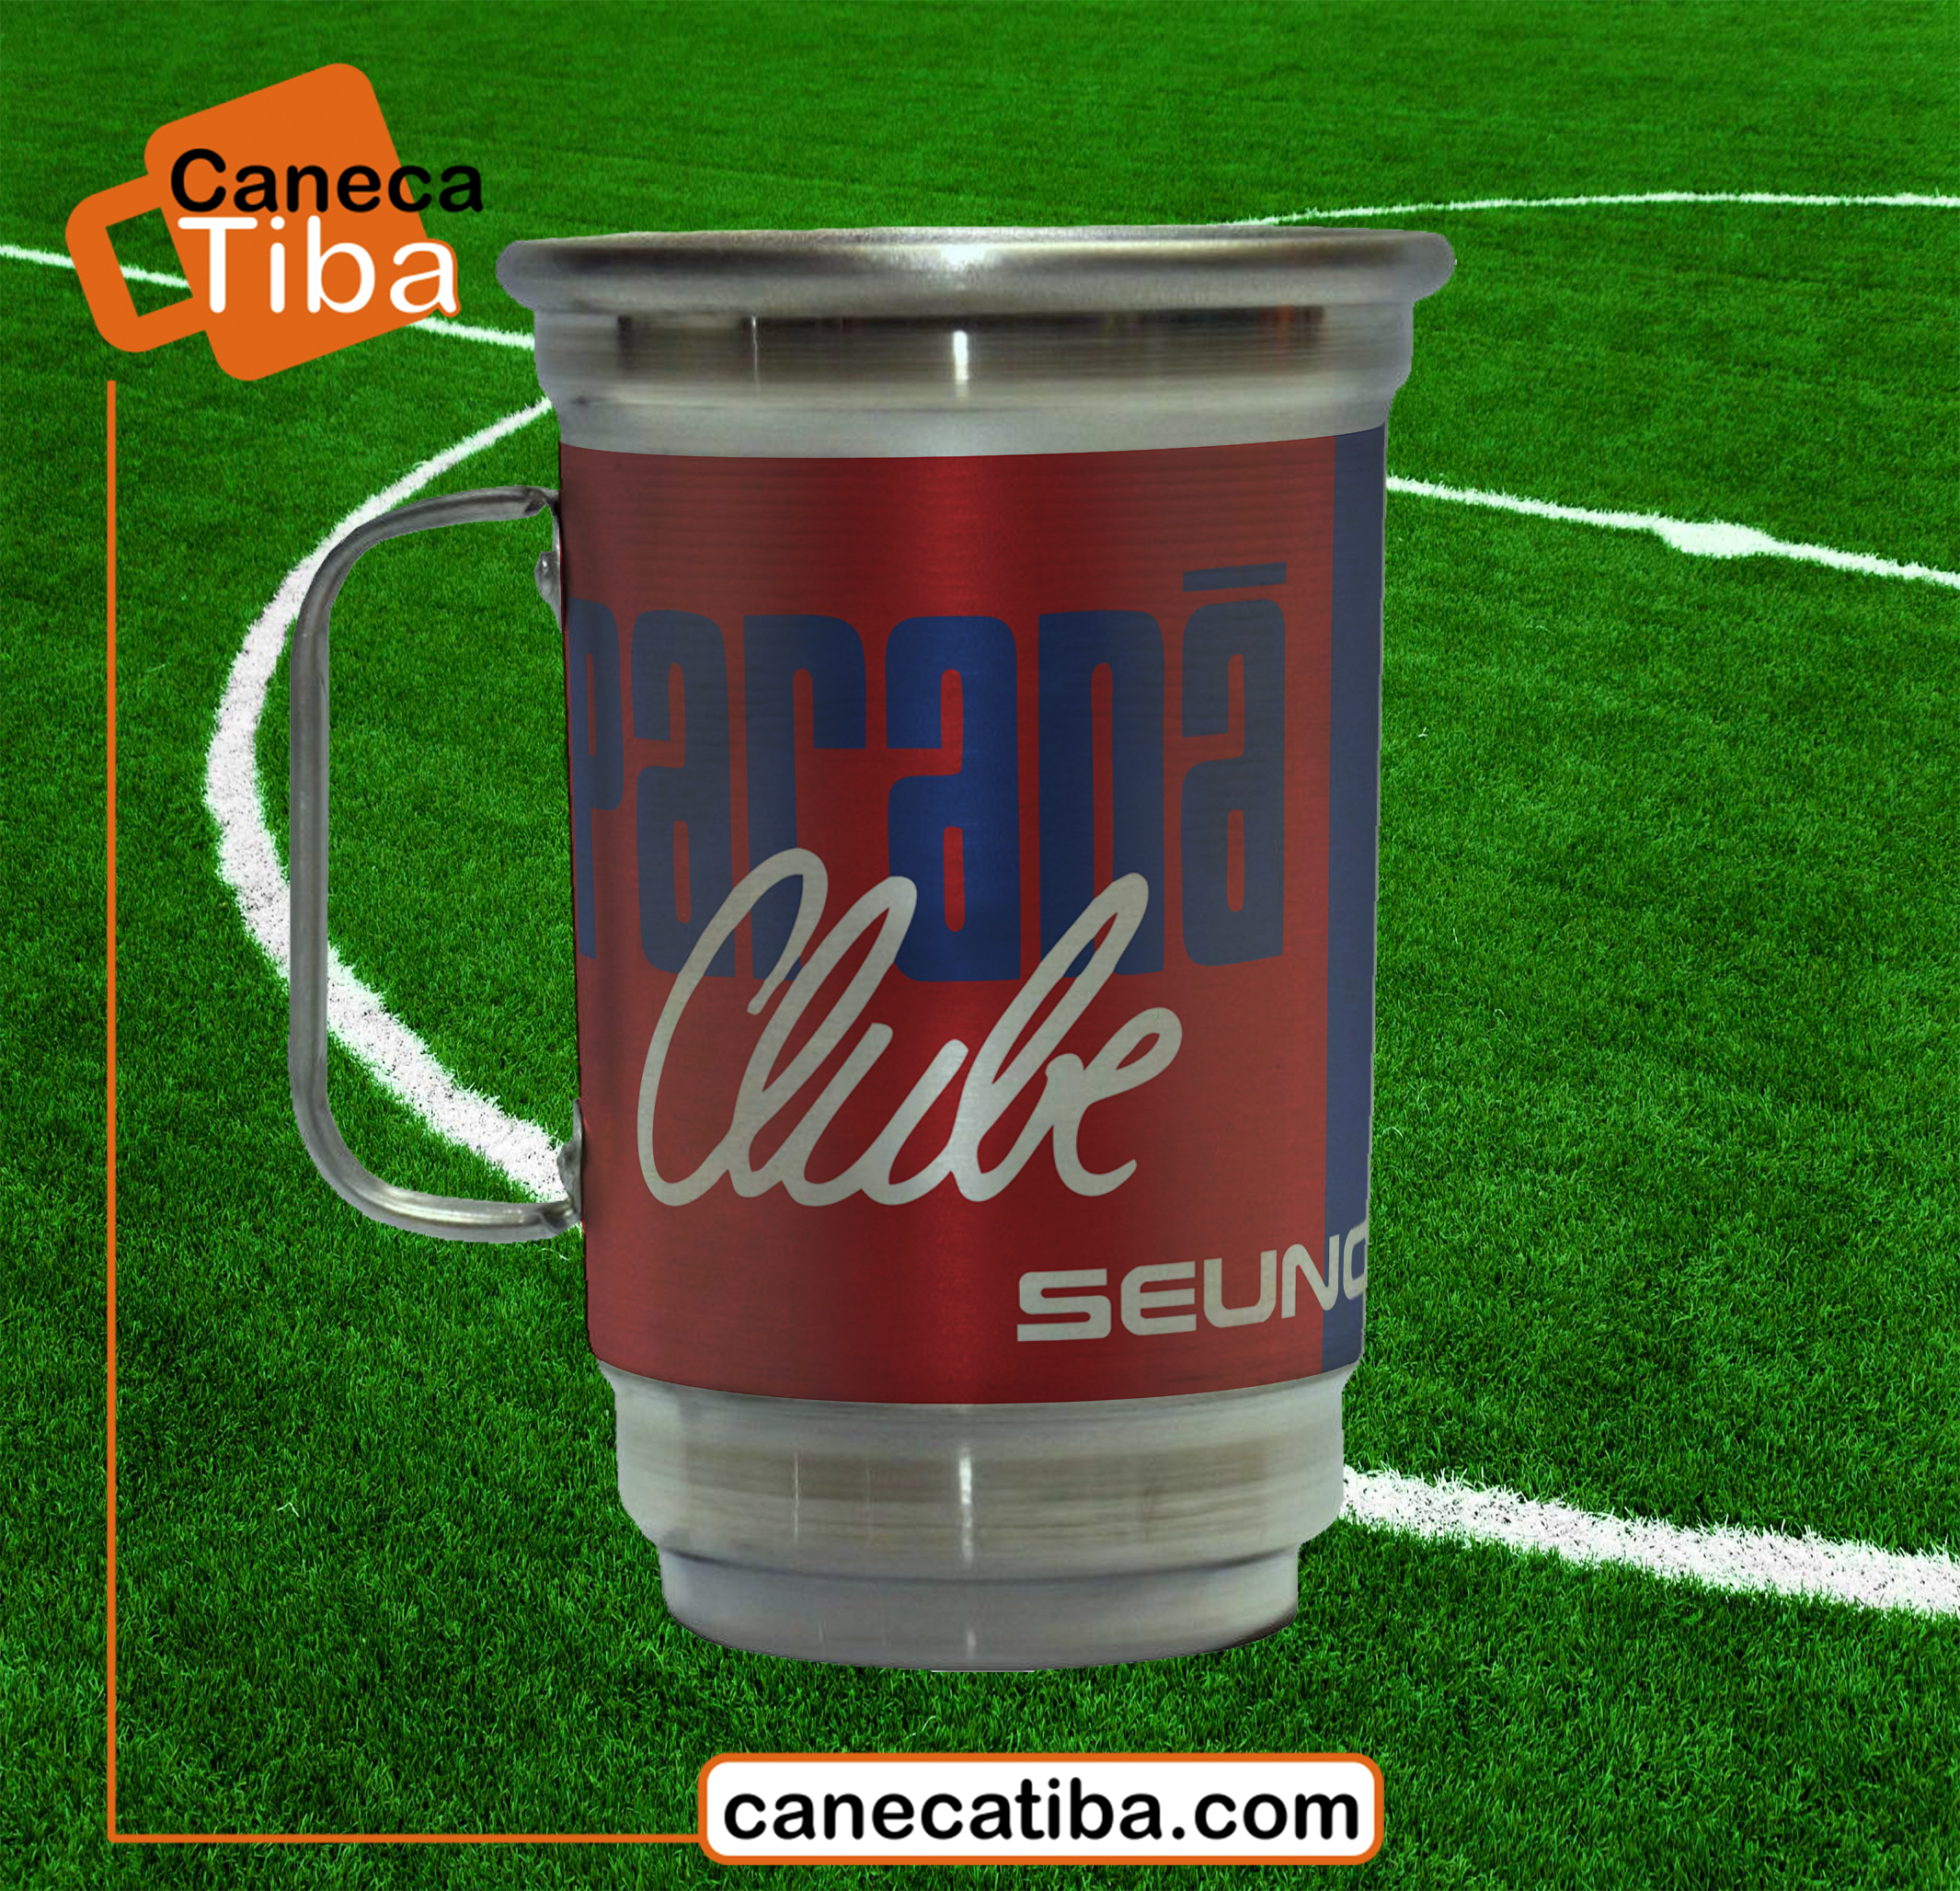 Time Parana Clube  da194b42e5293